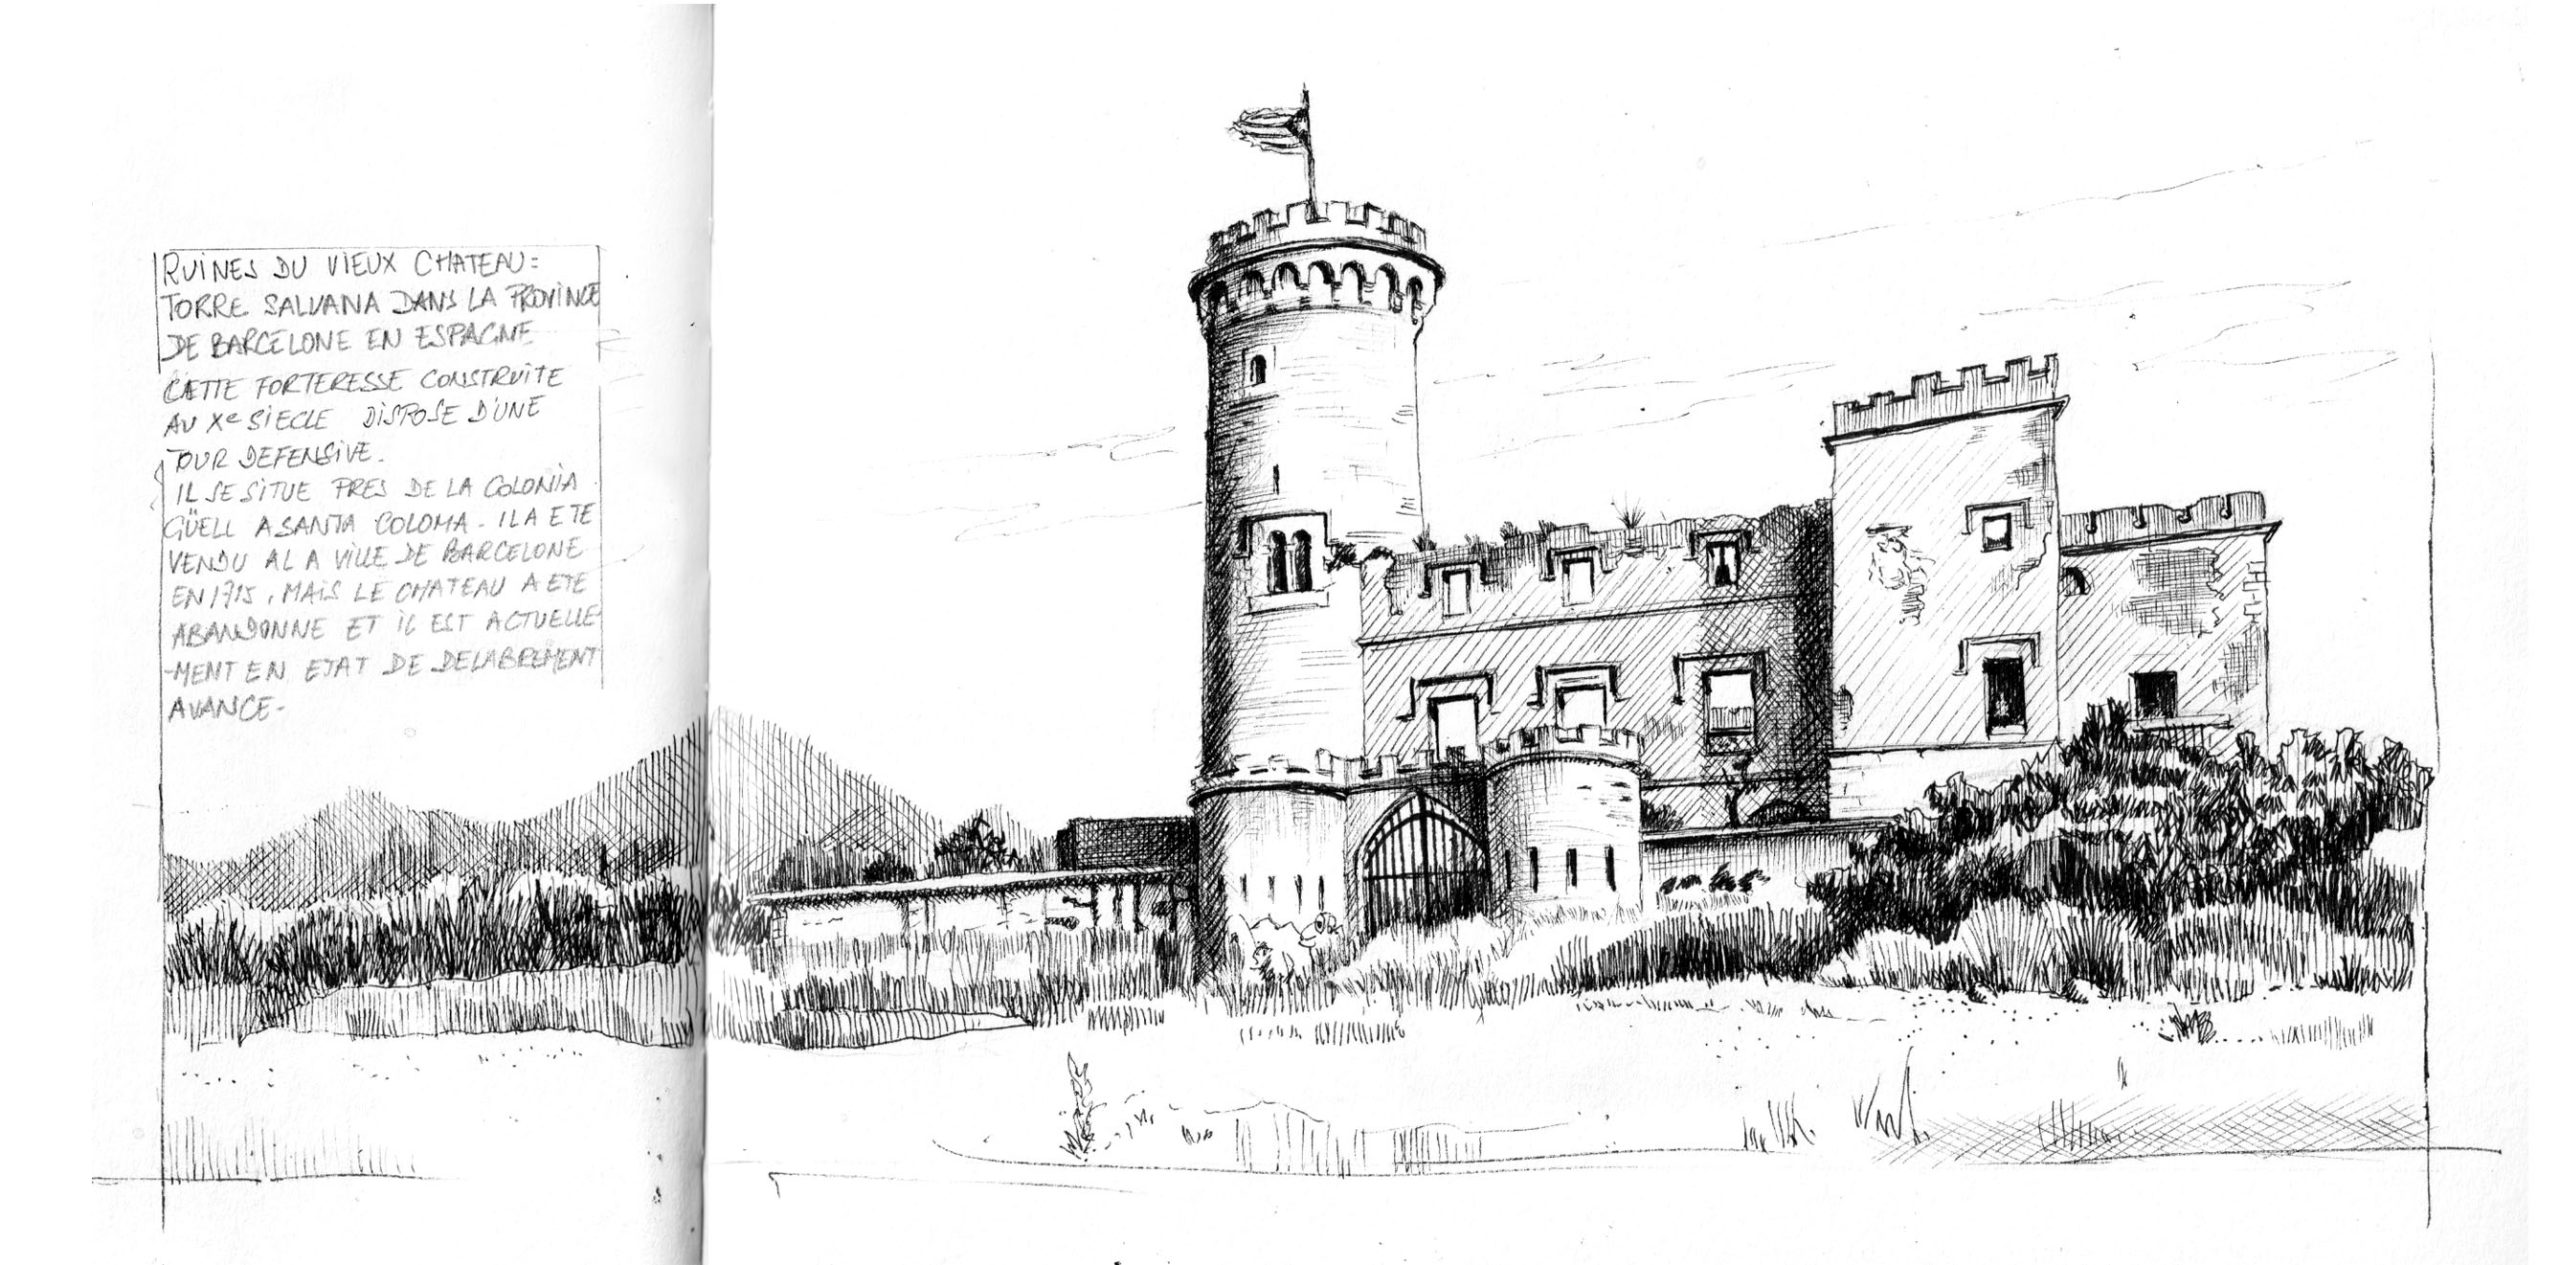 Torre Salvana en Espagne ©I.F 2021